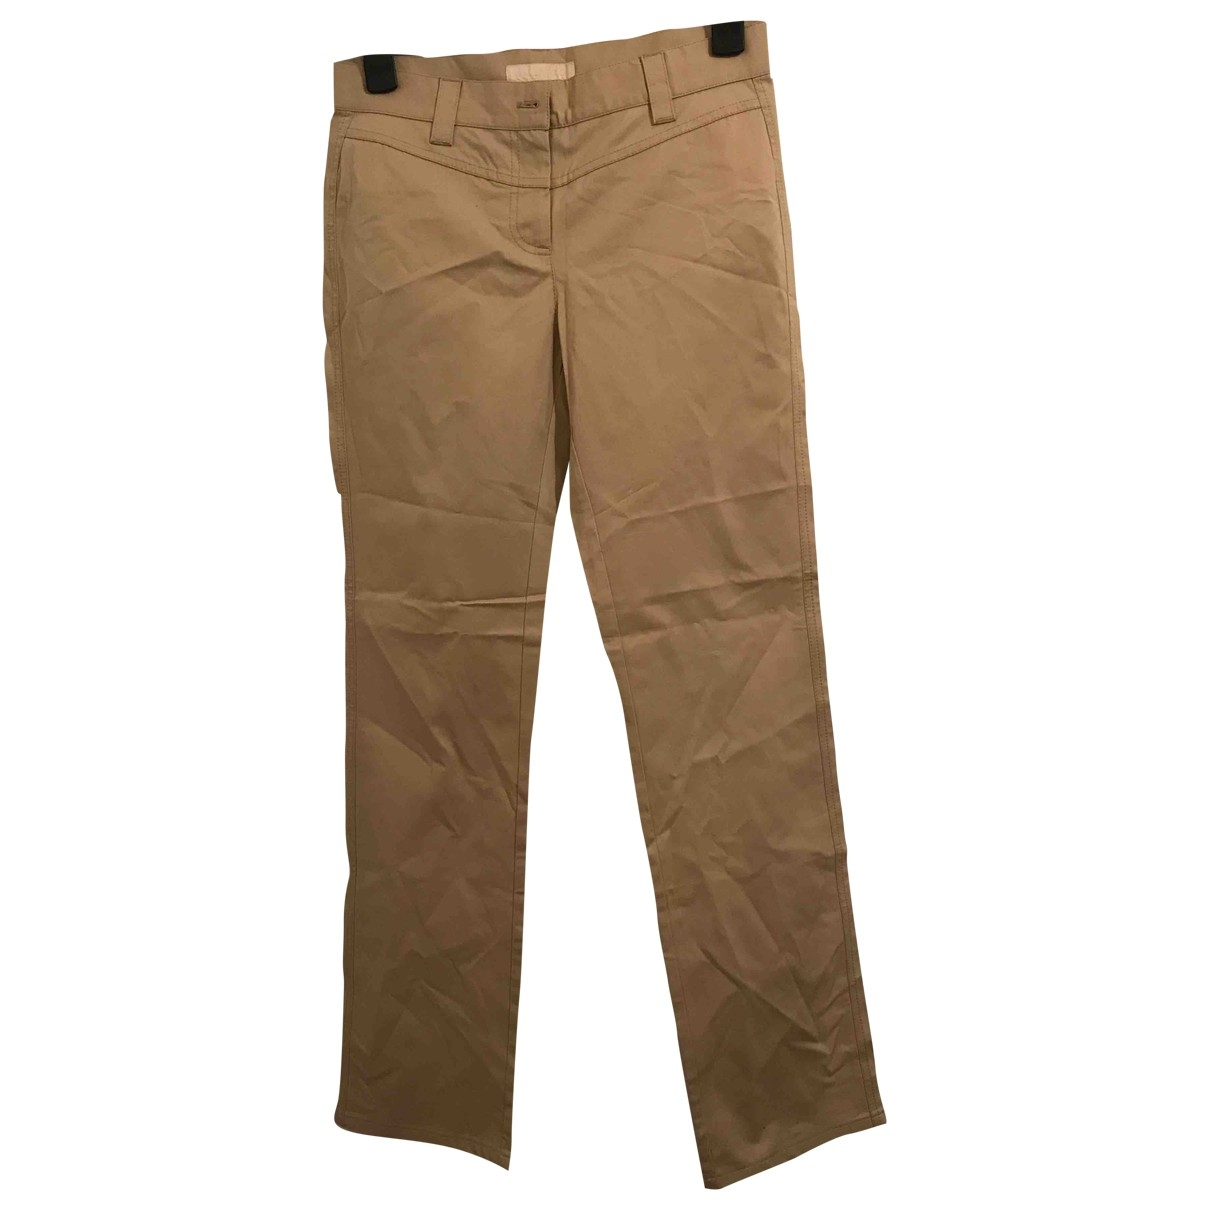 Valentino Garavani \N Beige Cotton Trousers for Women 8 US